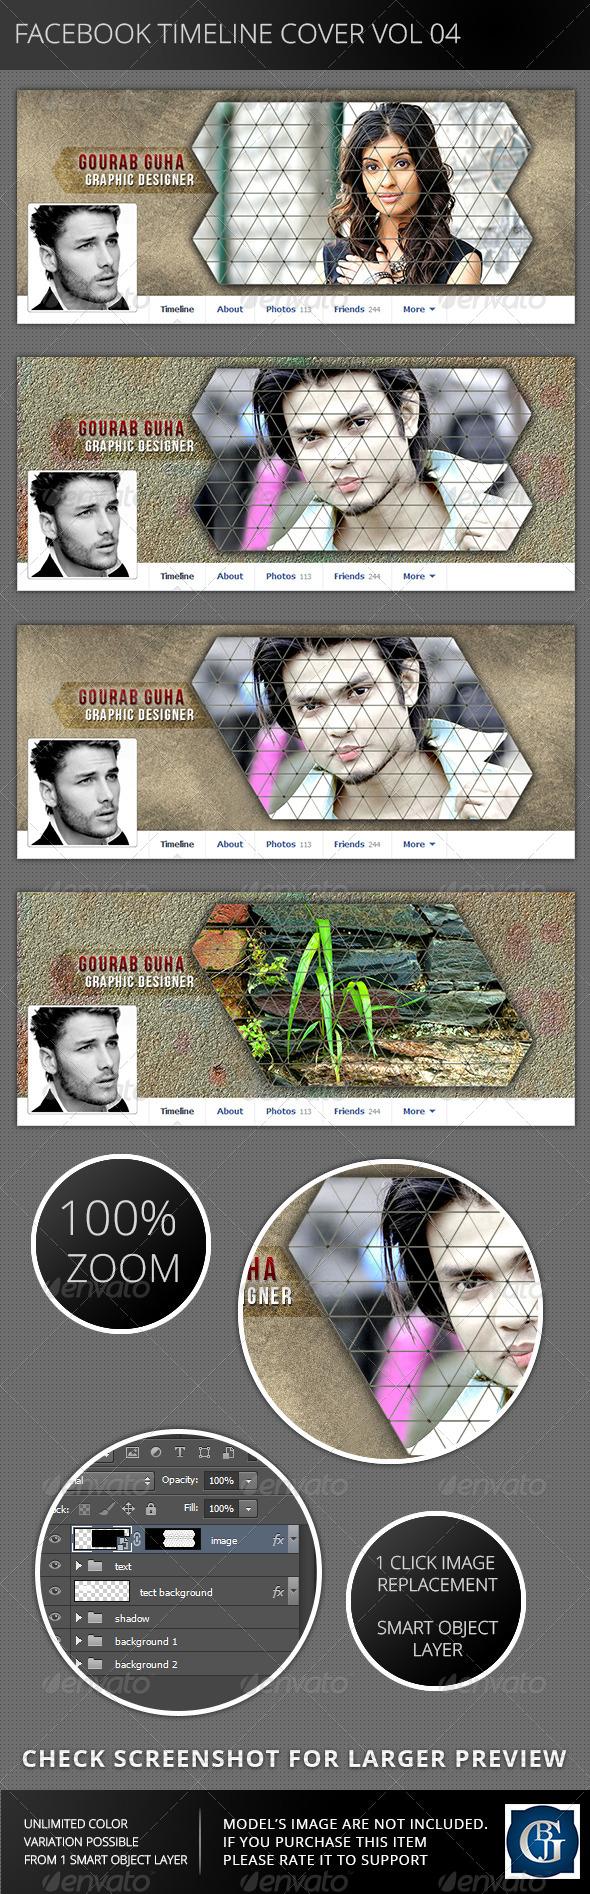 GraphicRiver Facebook Timeline Cover Vol 04 6219794